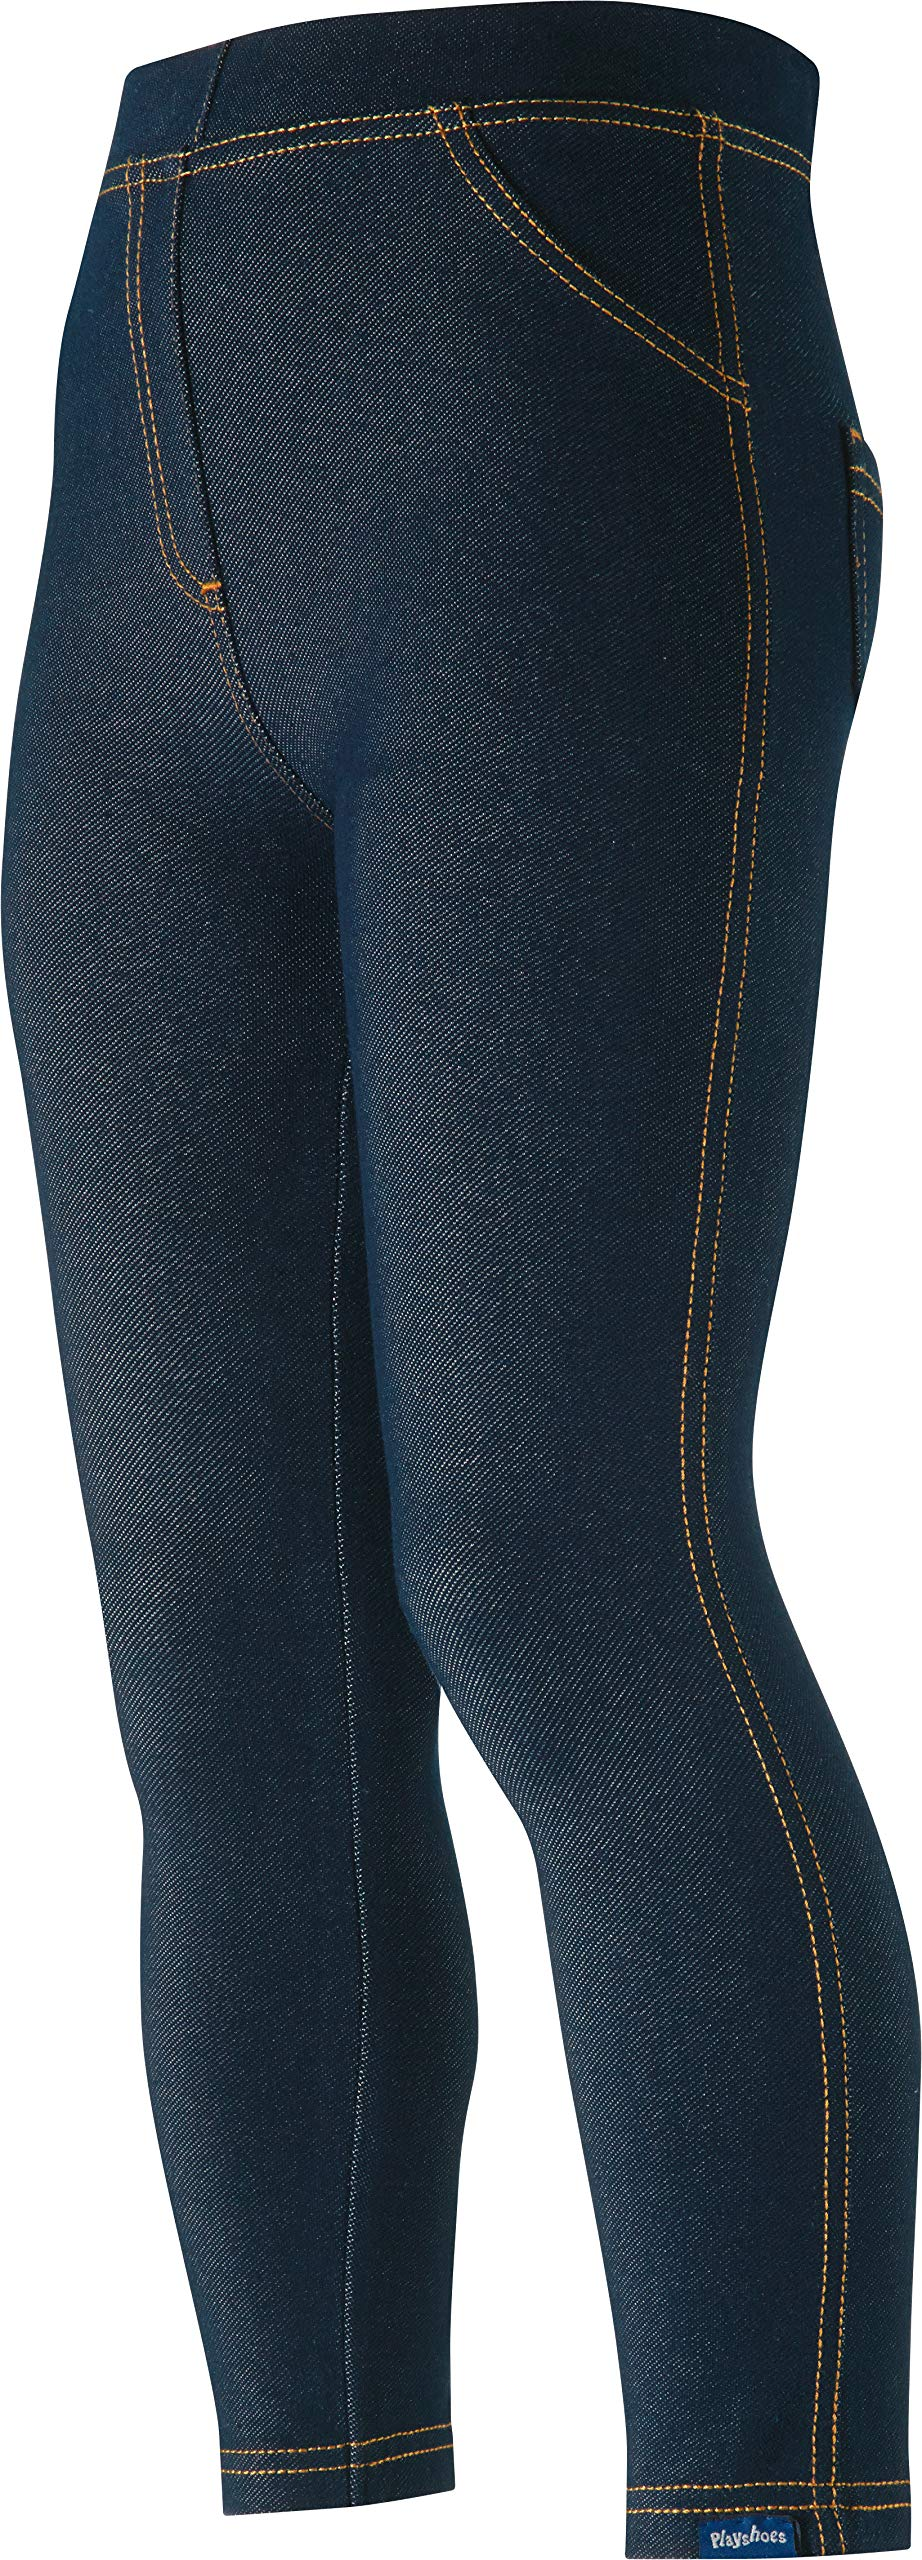 Playshoes Leggings Lang Jeans-Optik Unisex bebé 1